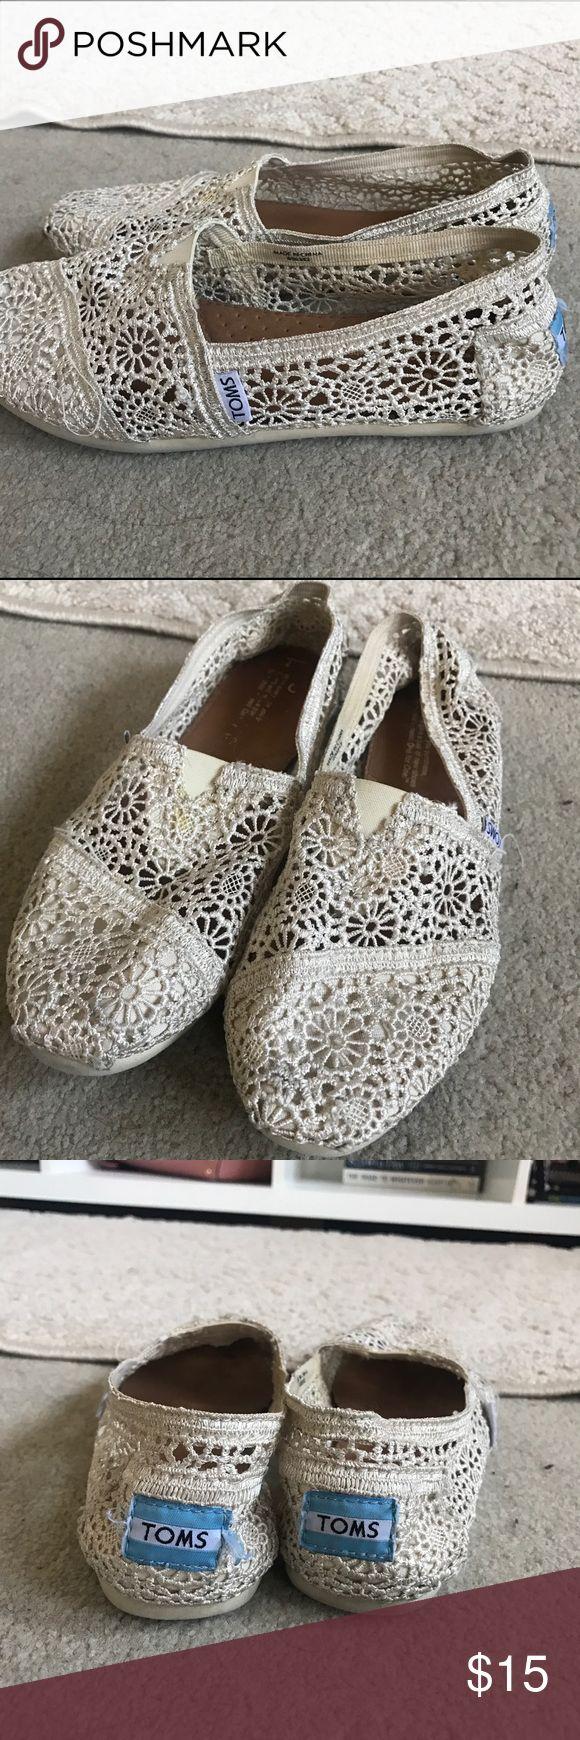 Crochet TOMS Size 7 :) crochet/lace white toms TOMS Shoes Flats & Loafers